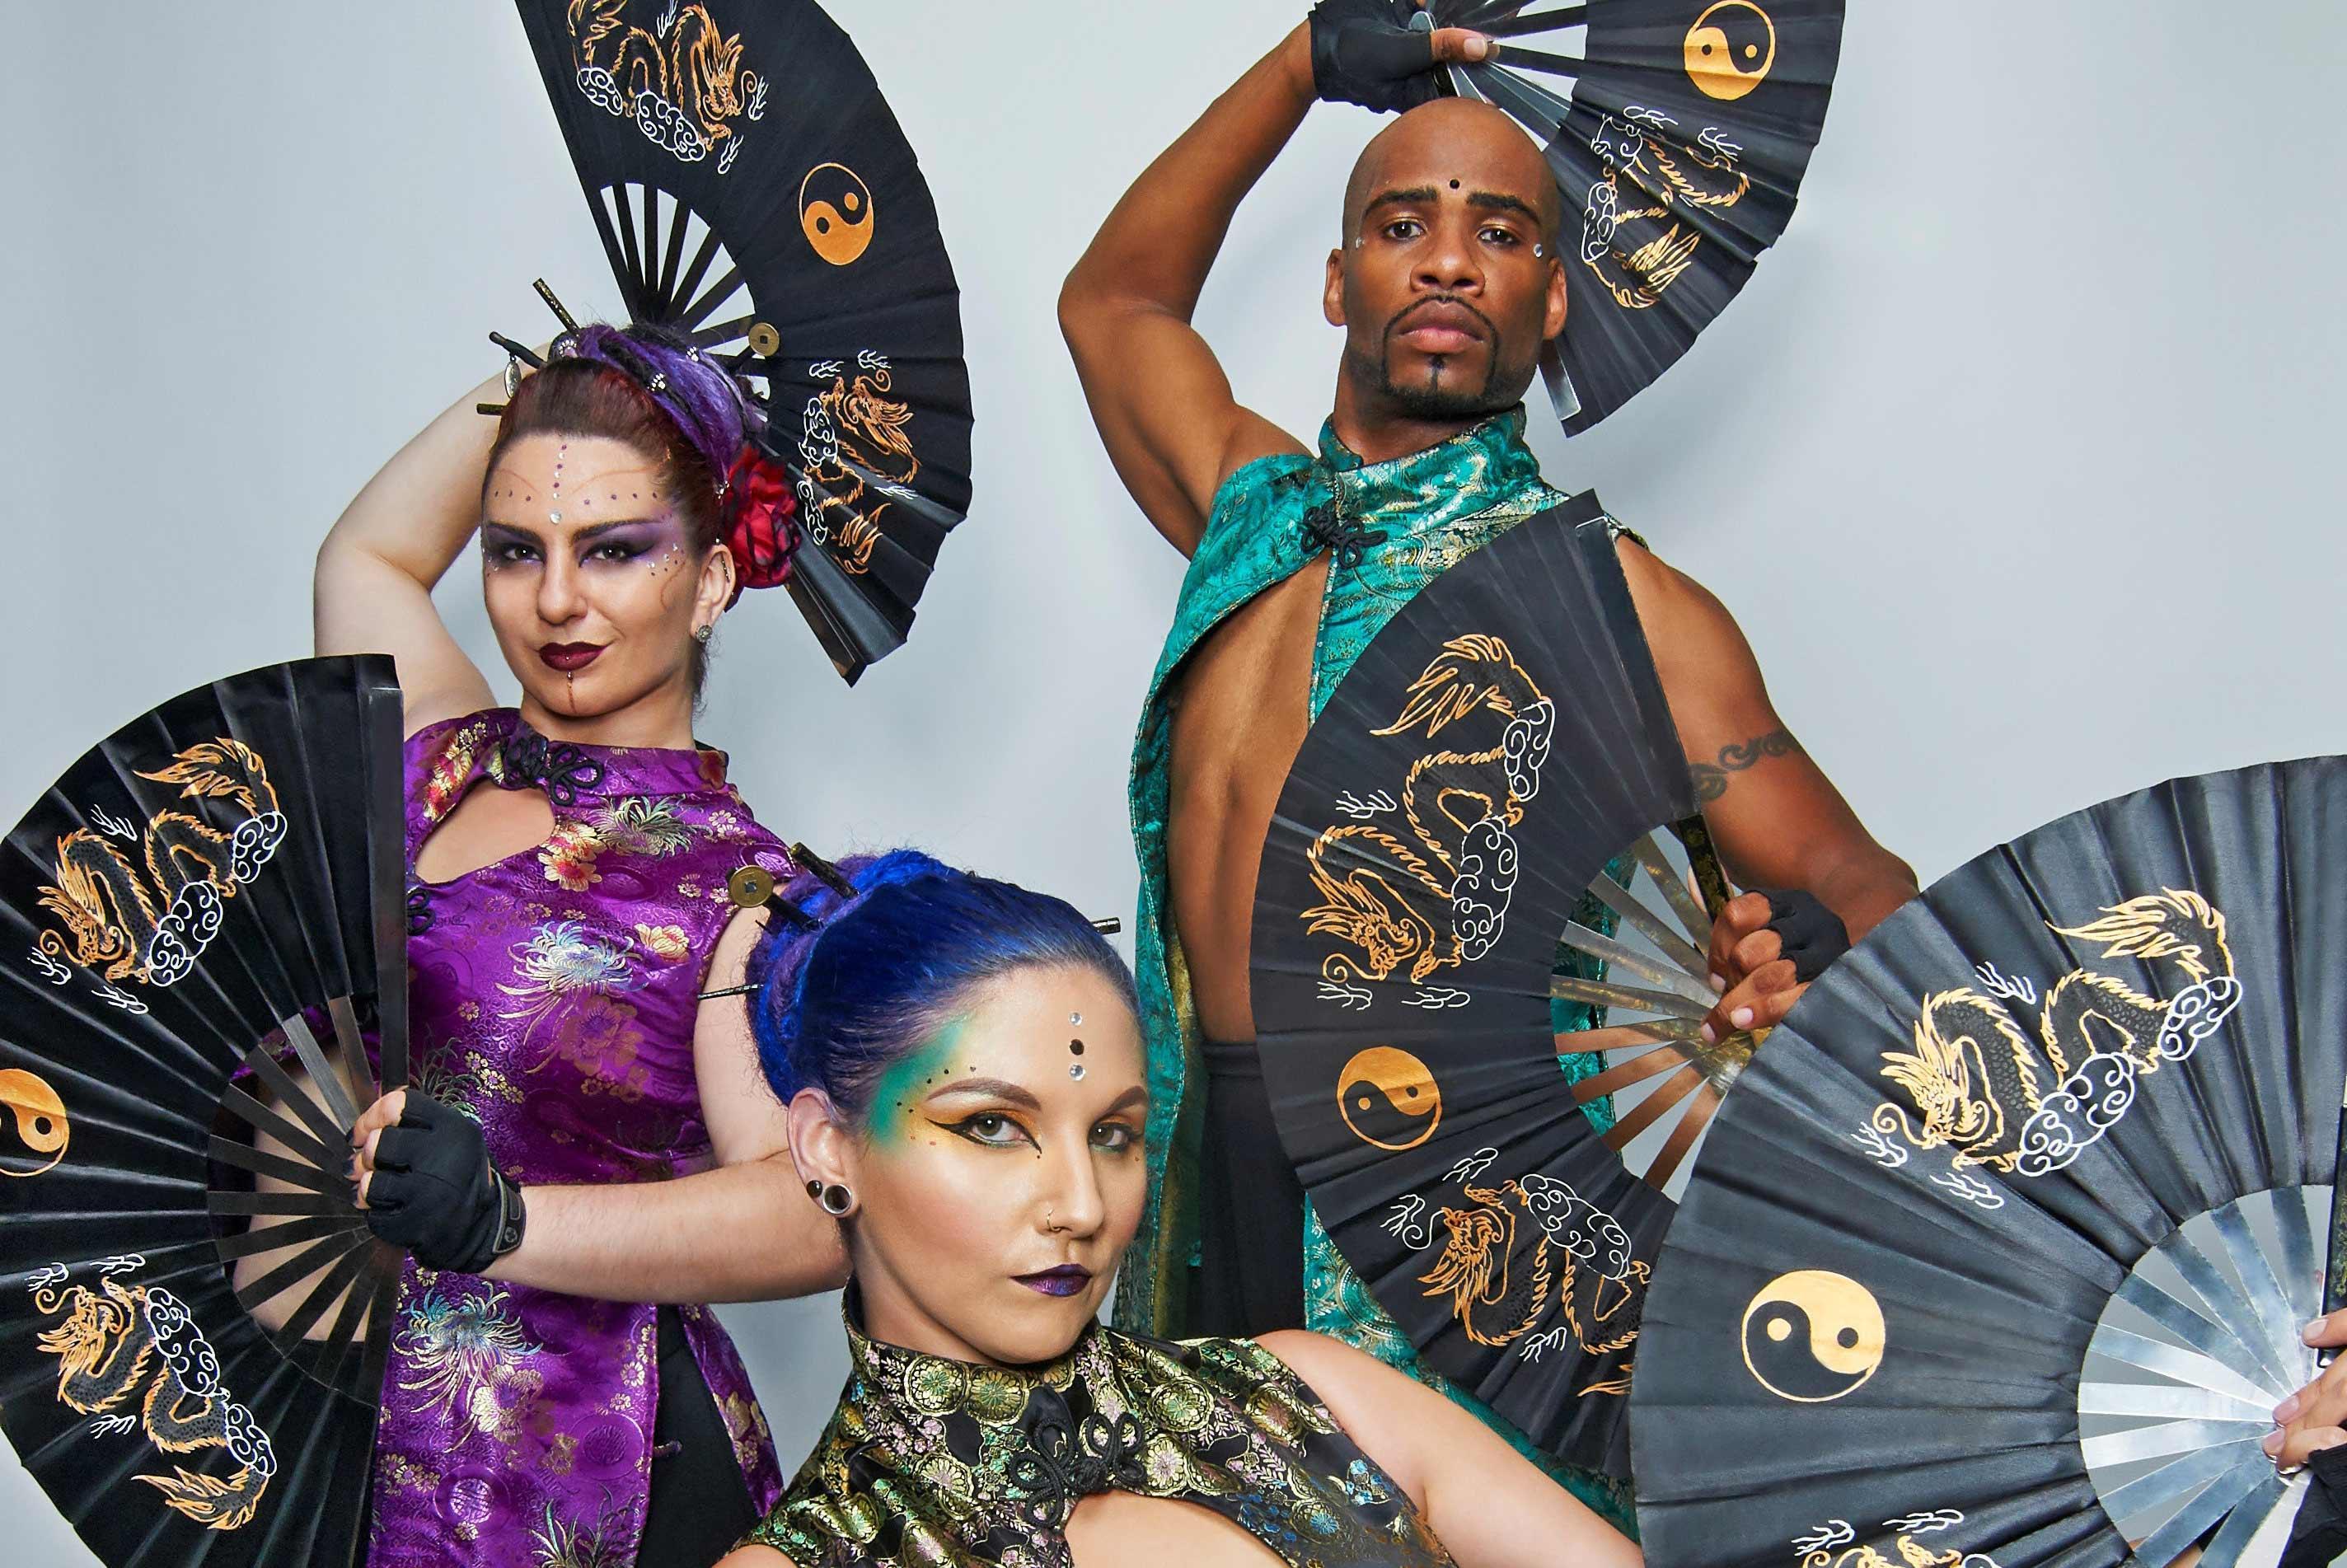 Karin Jensen & Mandala Dance Works